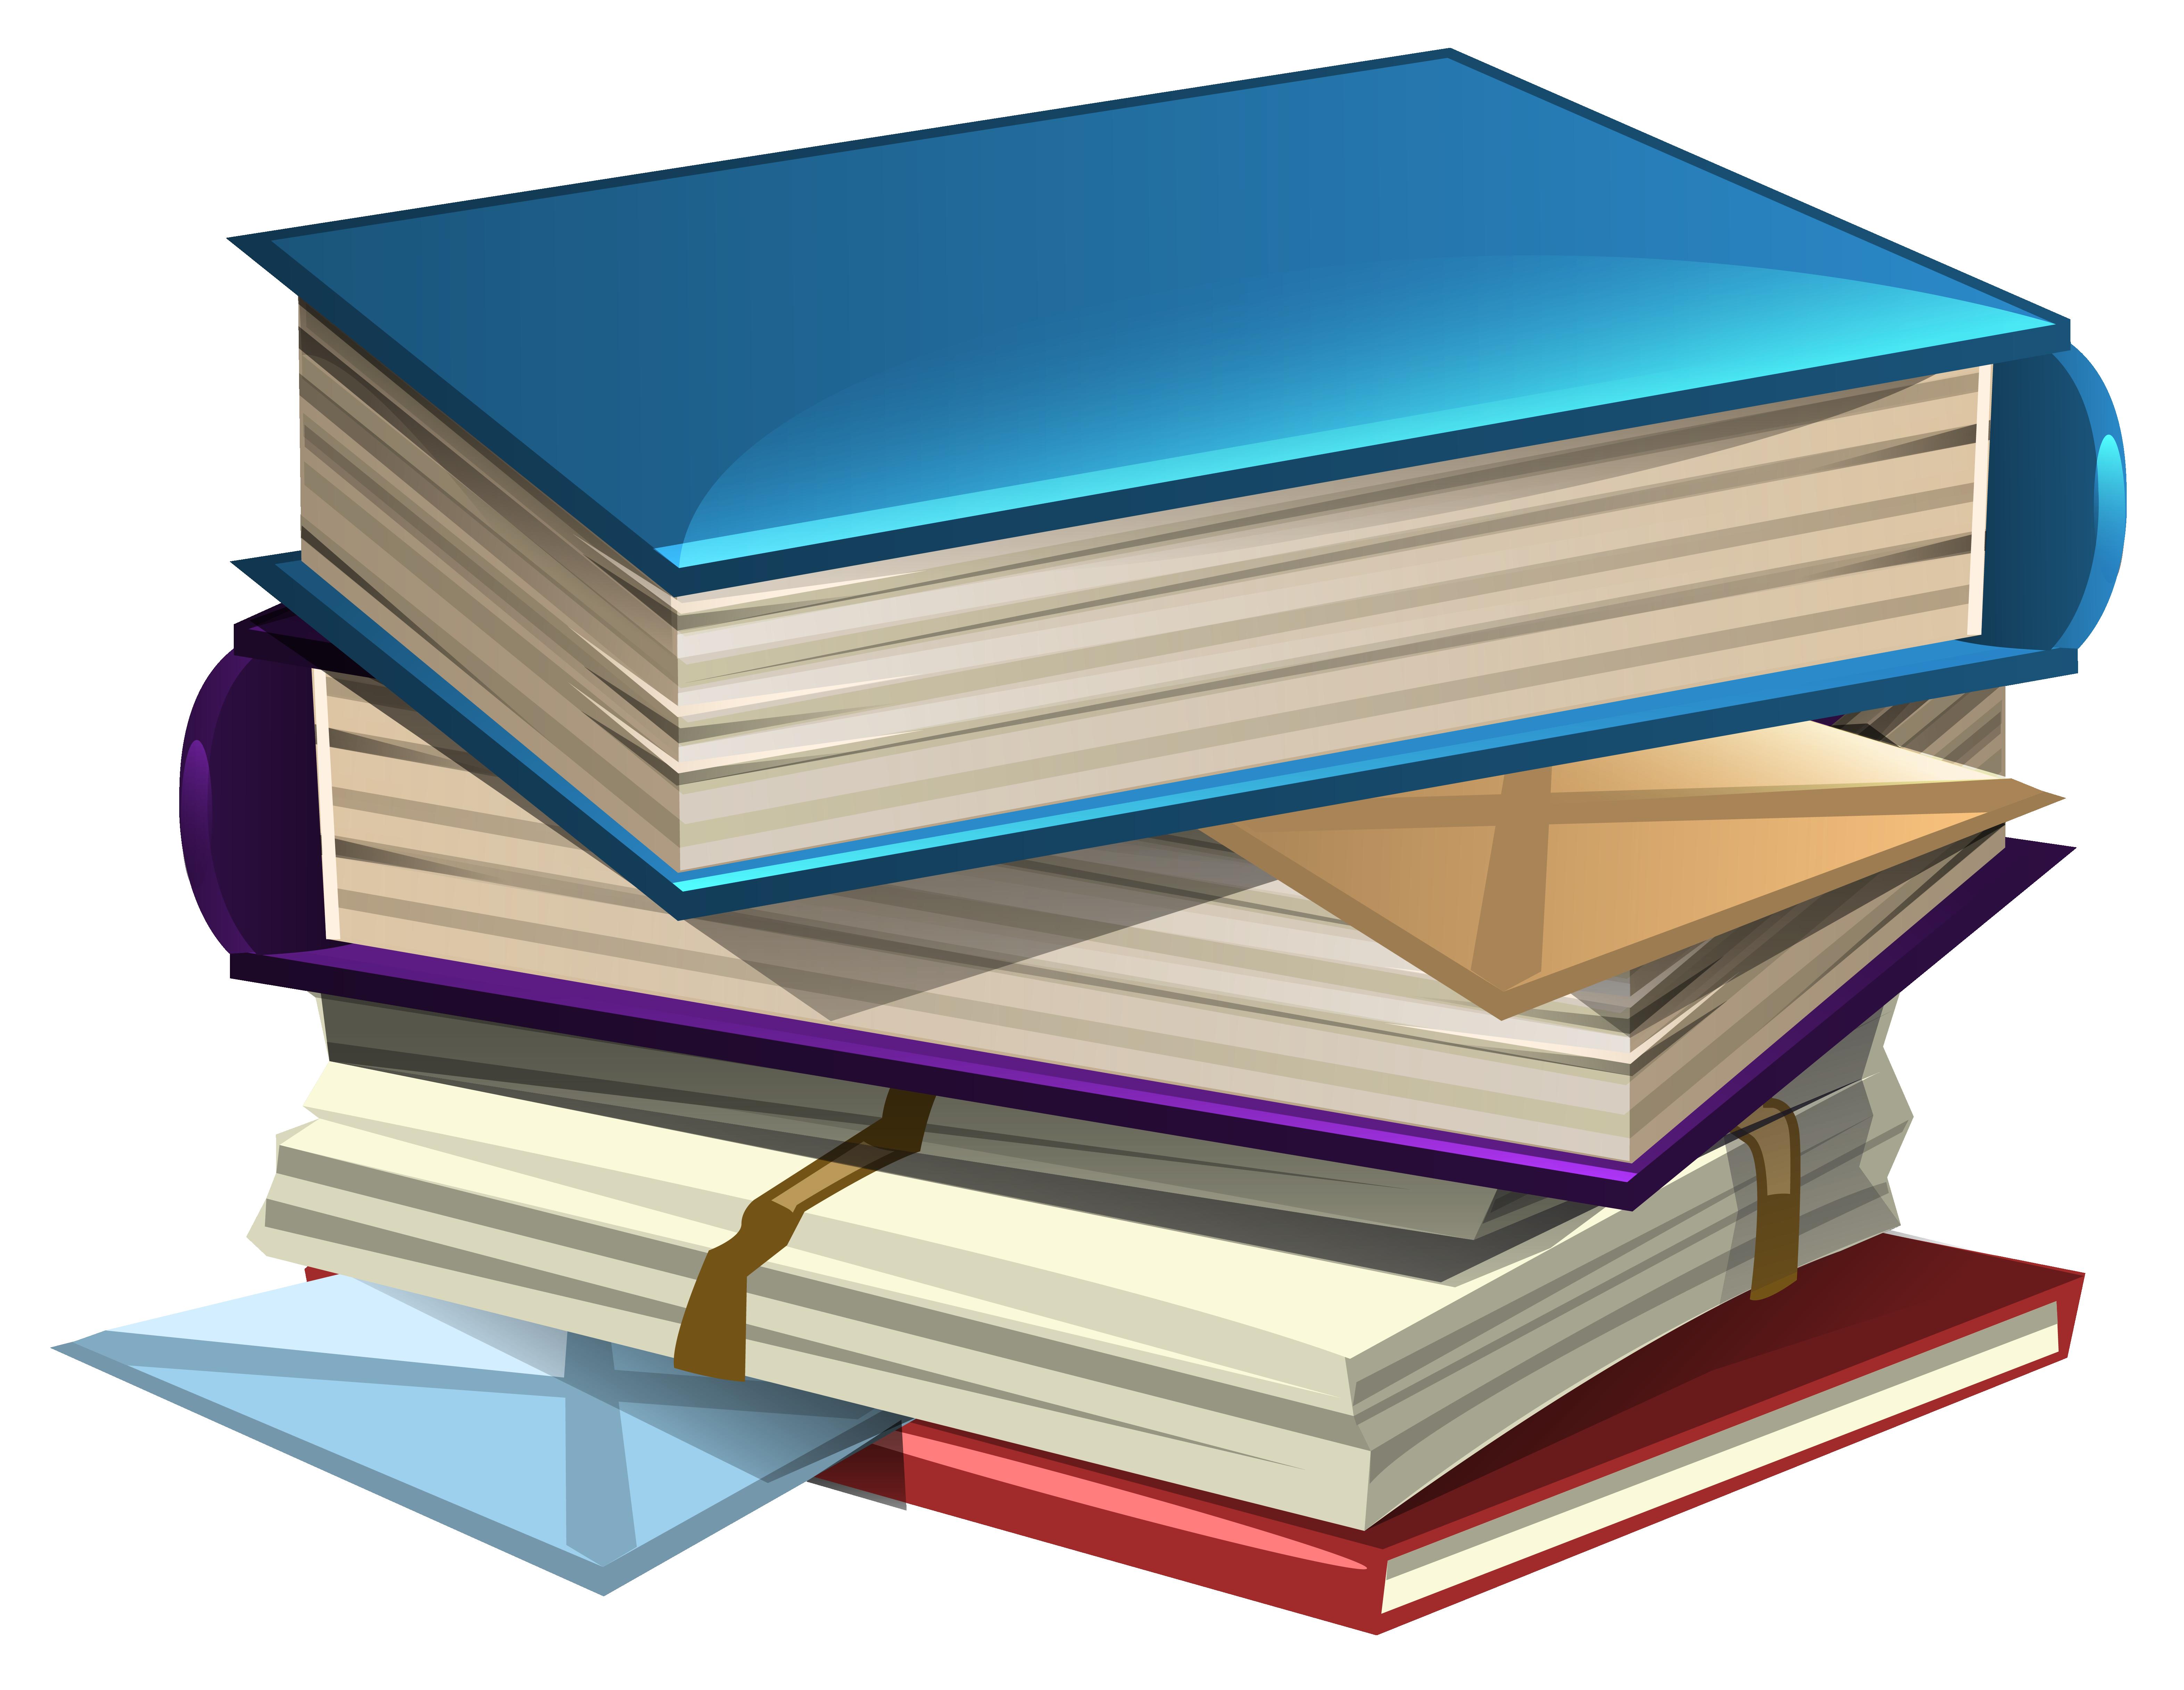 6288x4866 School Books Clipart Imageu200b Gallery Yopriceville